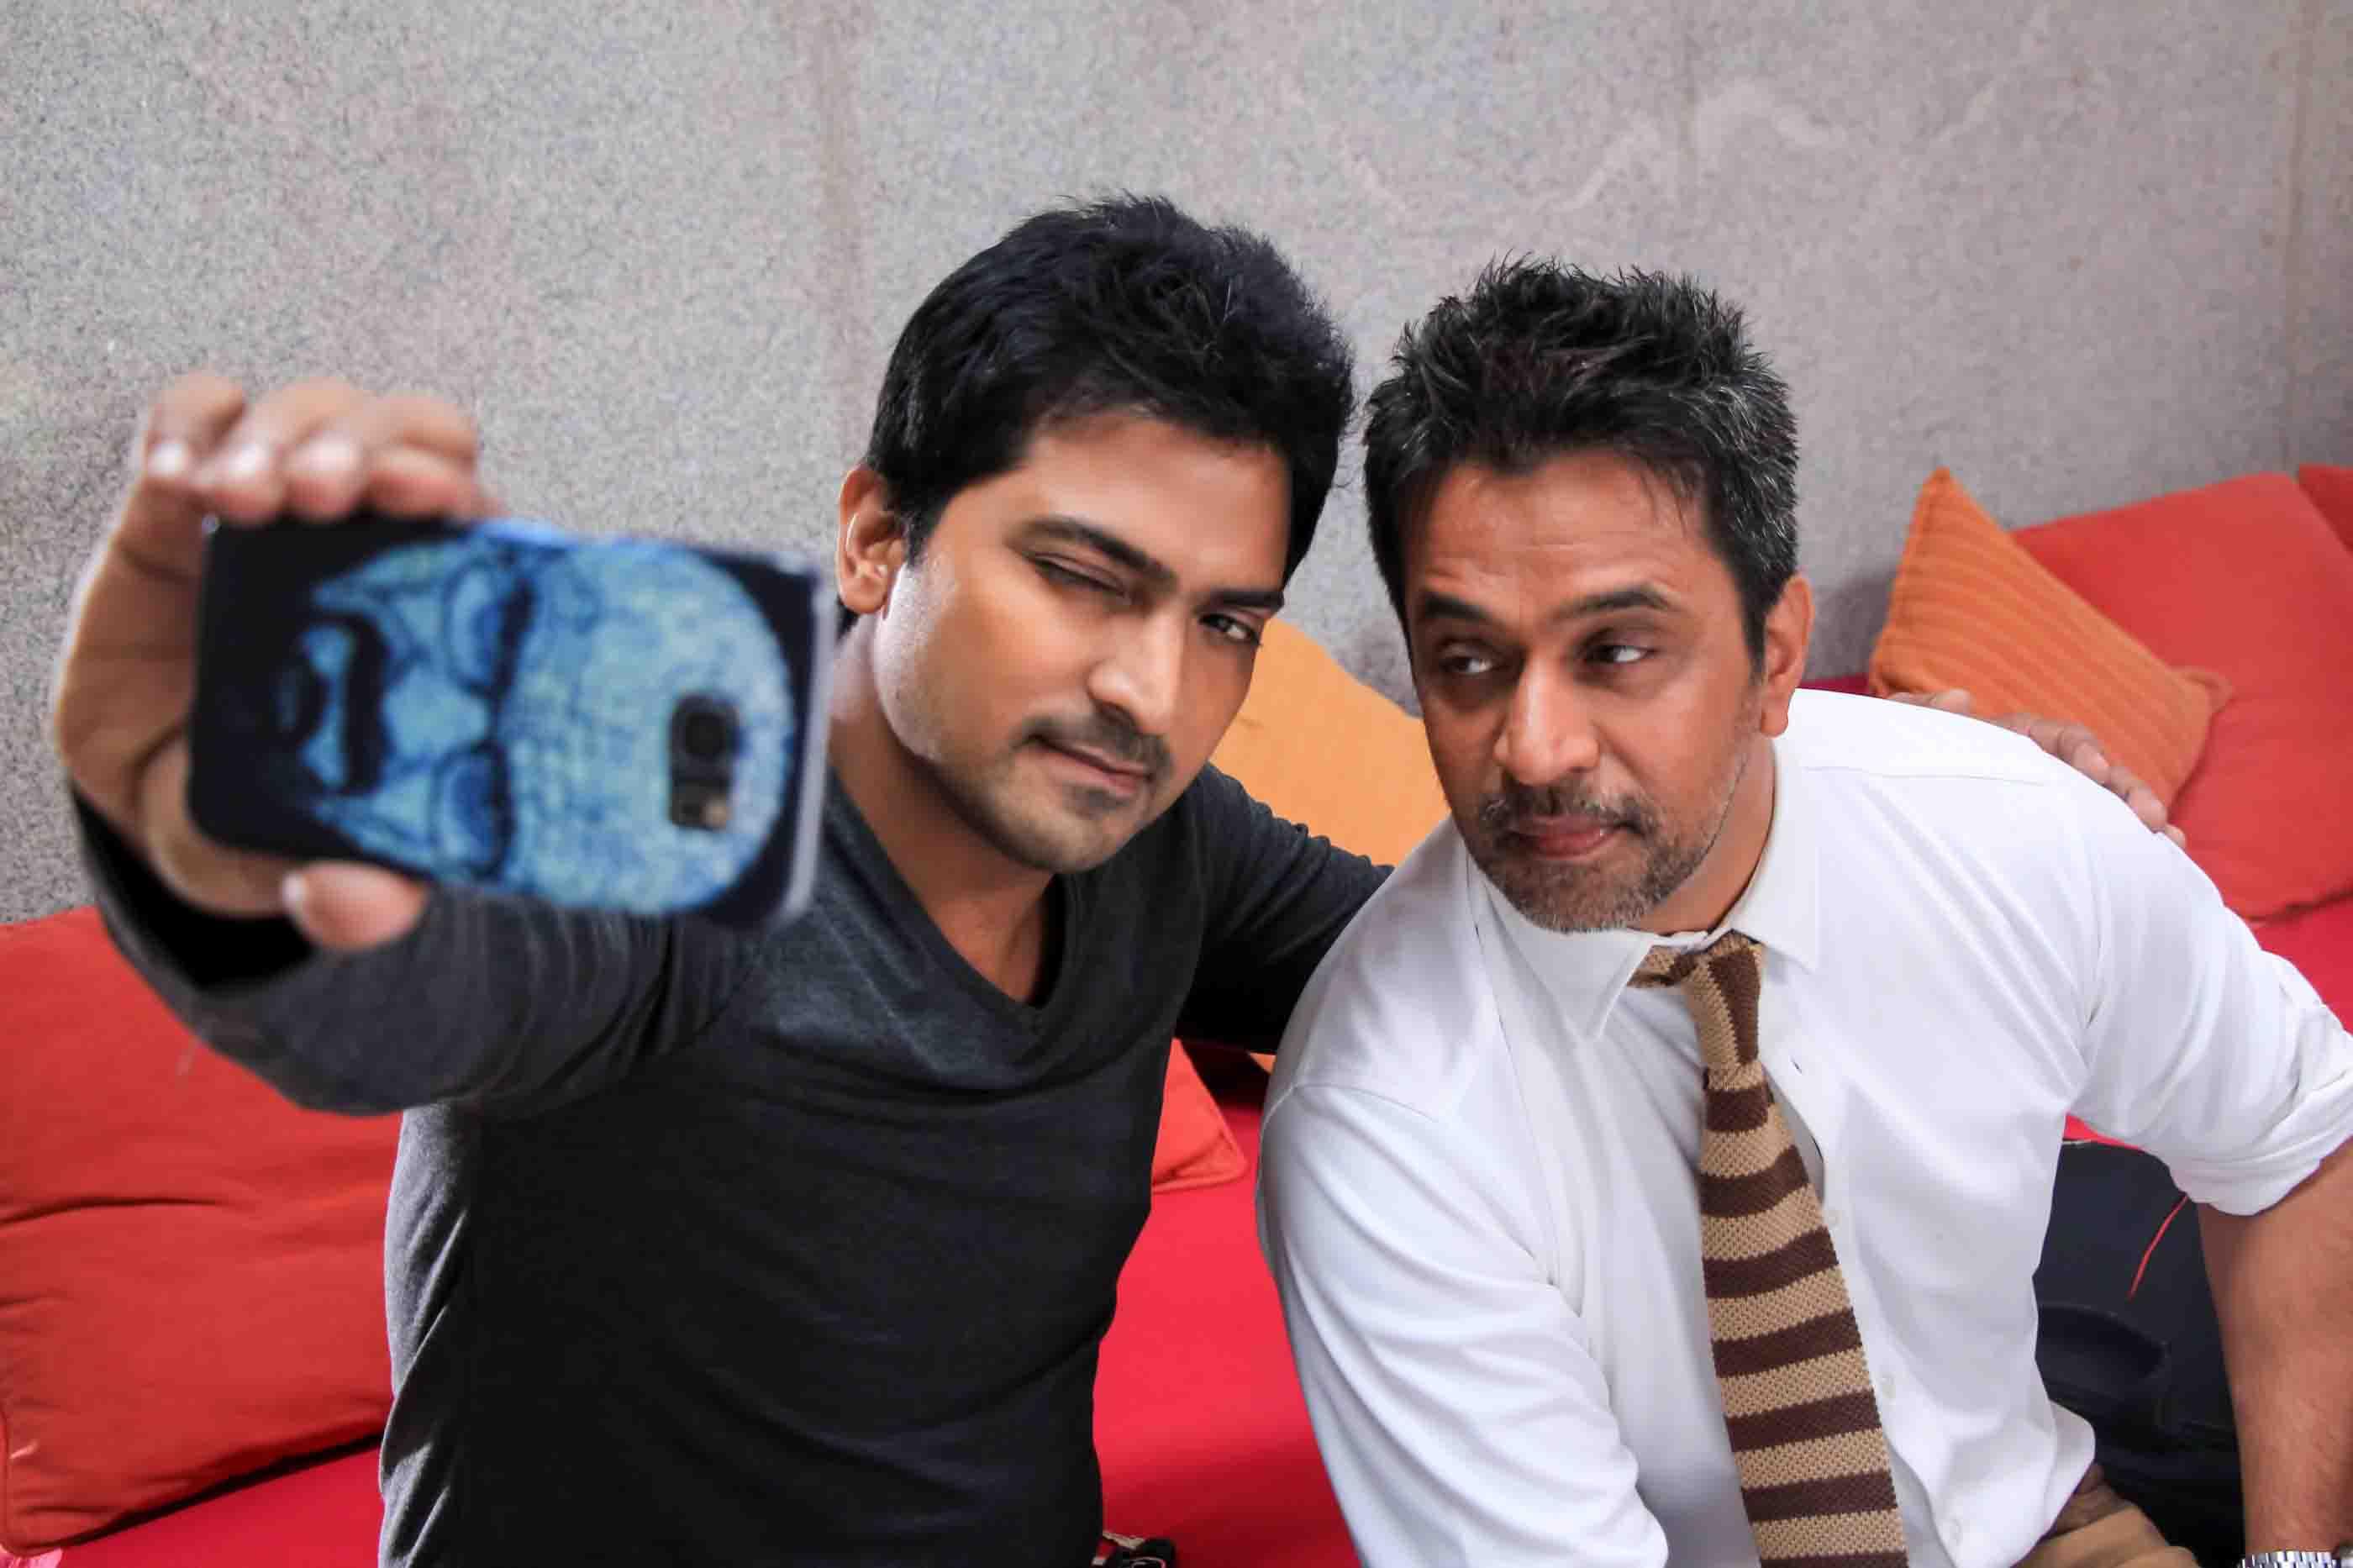 Nibunan arjun sarja vaibhav reddy selfie photos